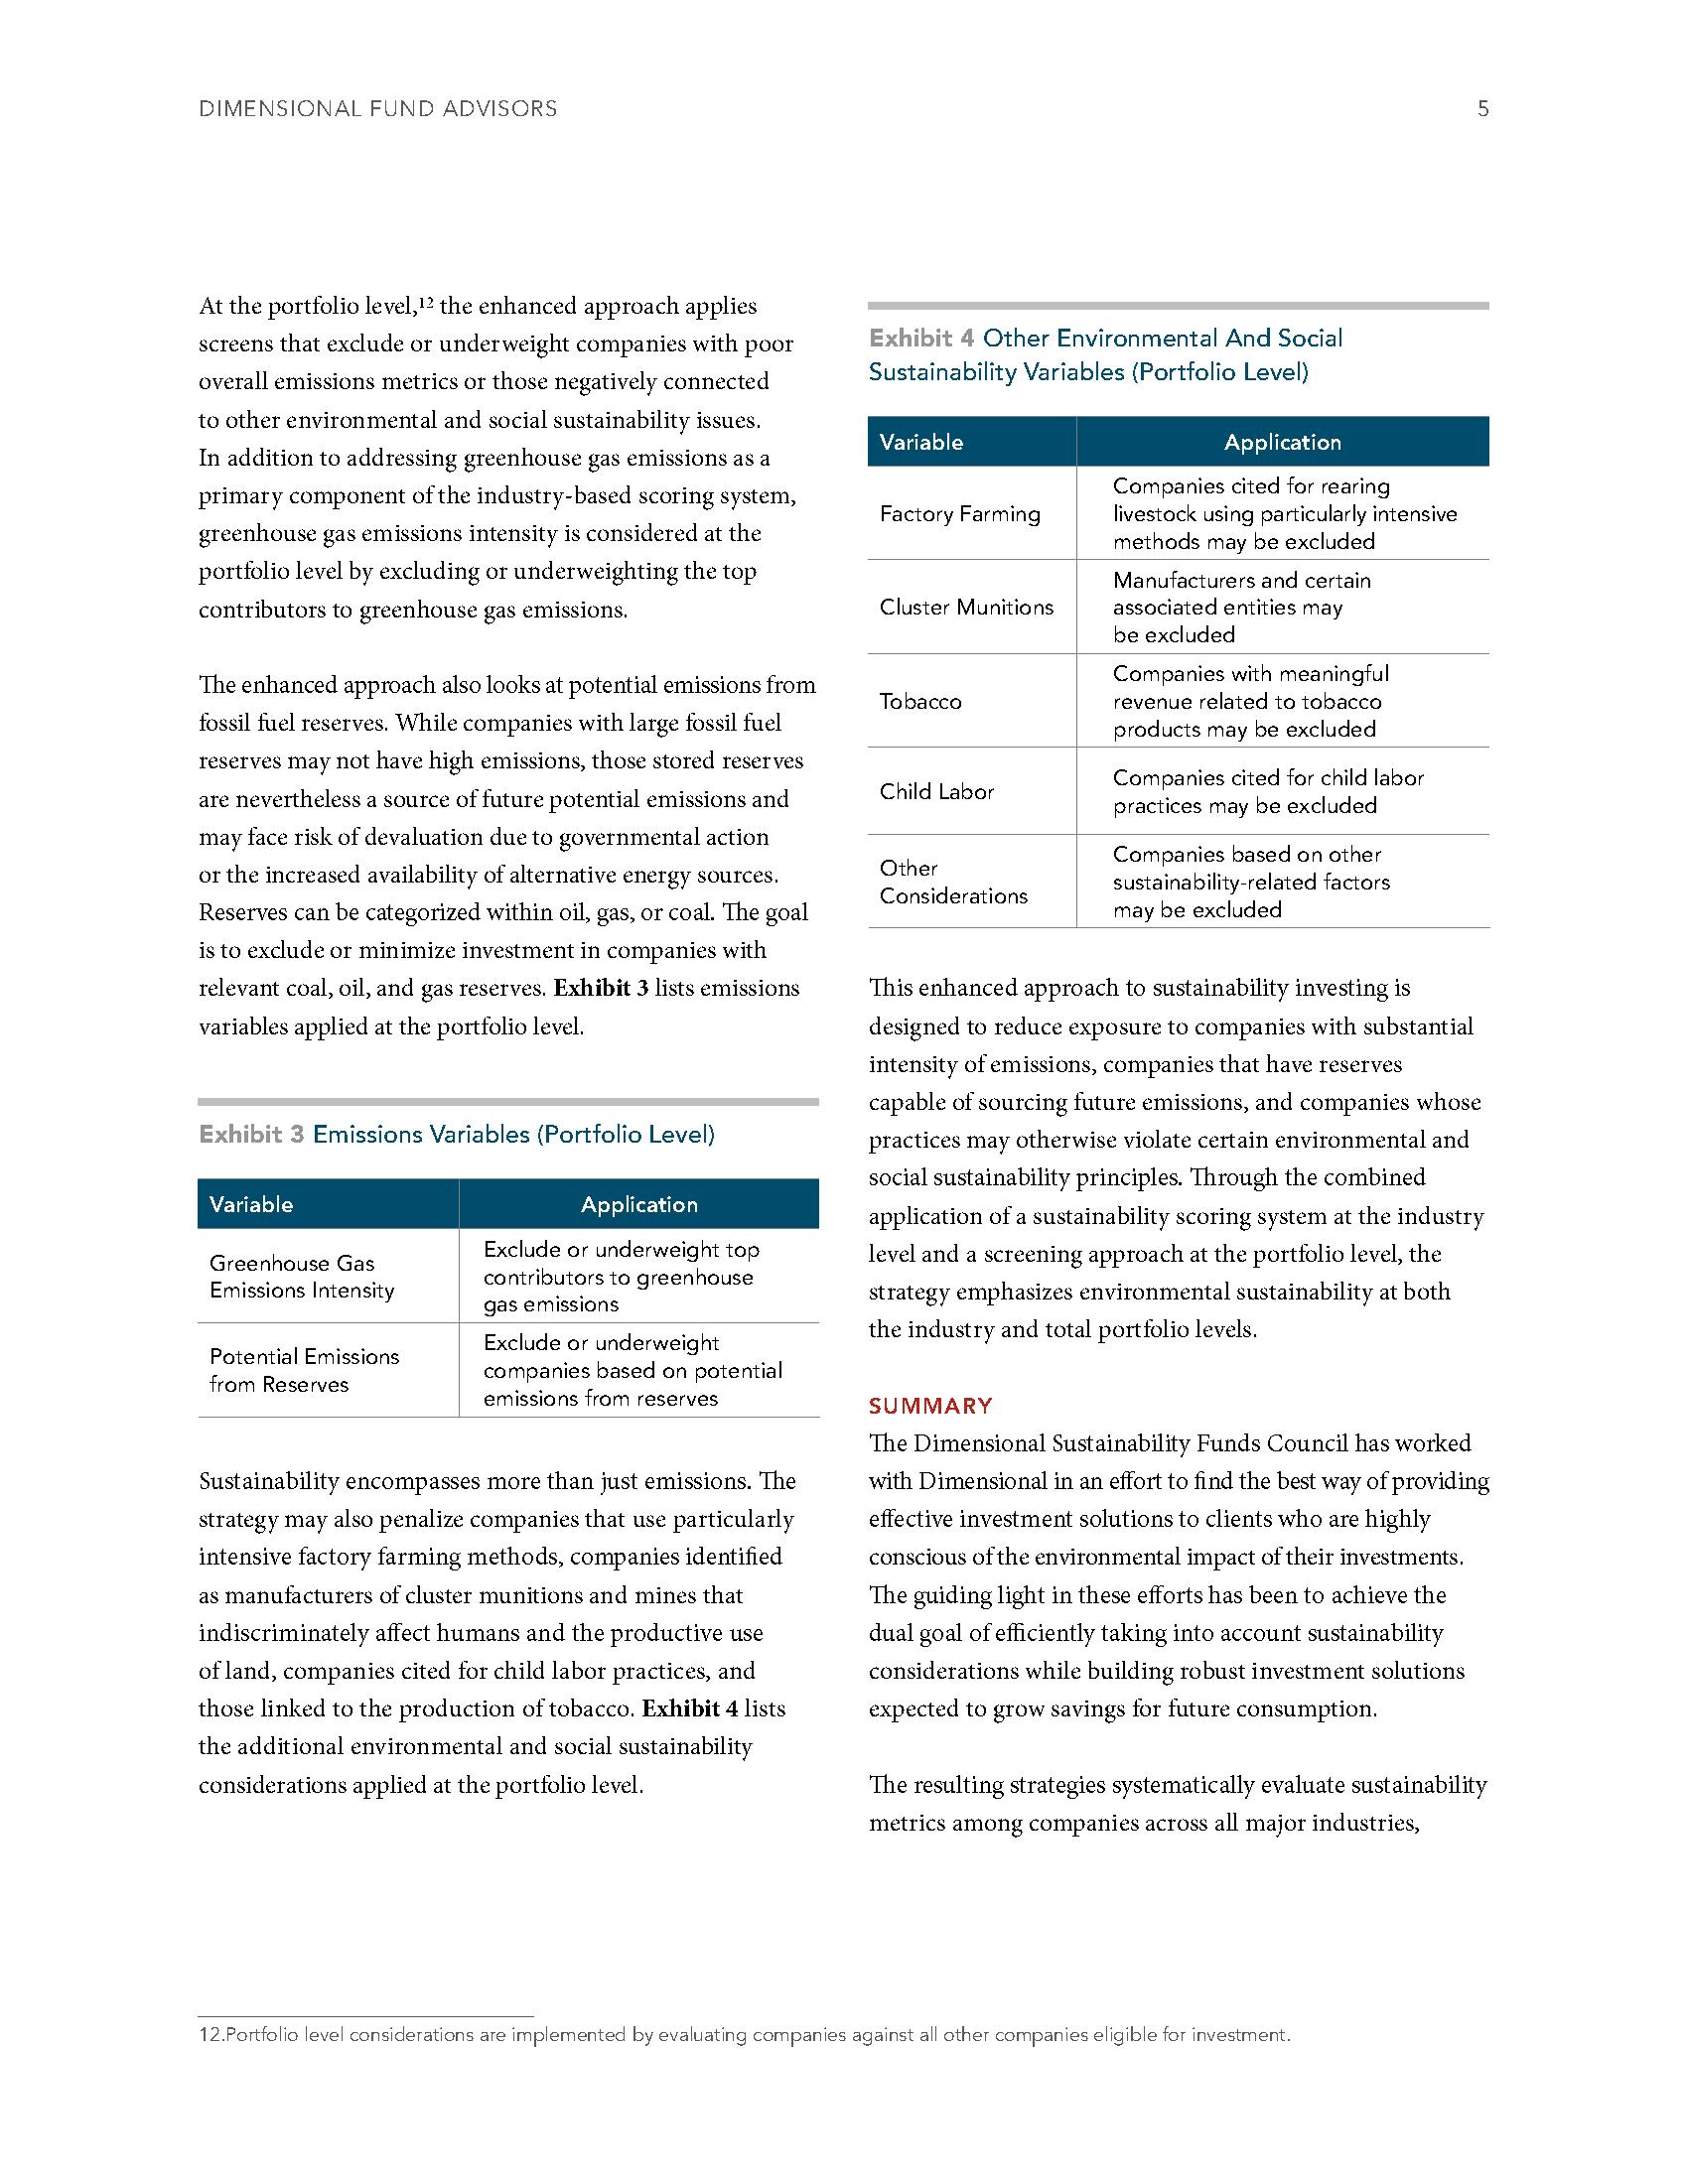 Sustainability Investing CFP DFA 5